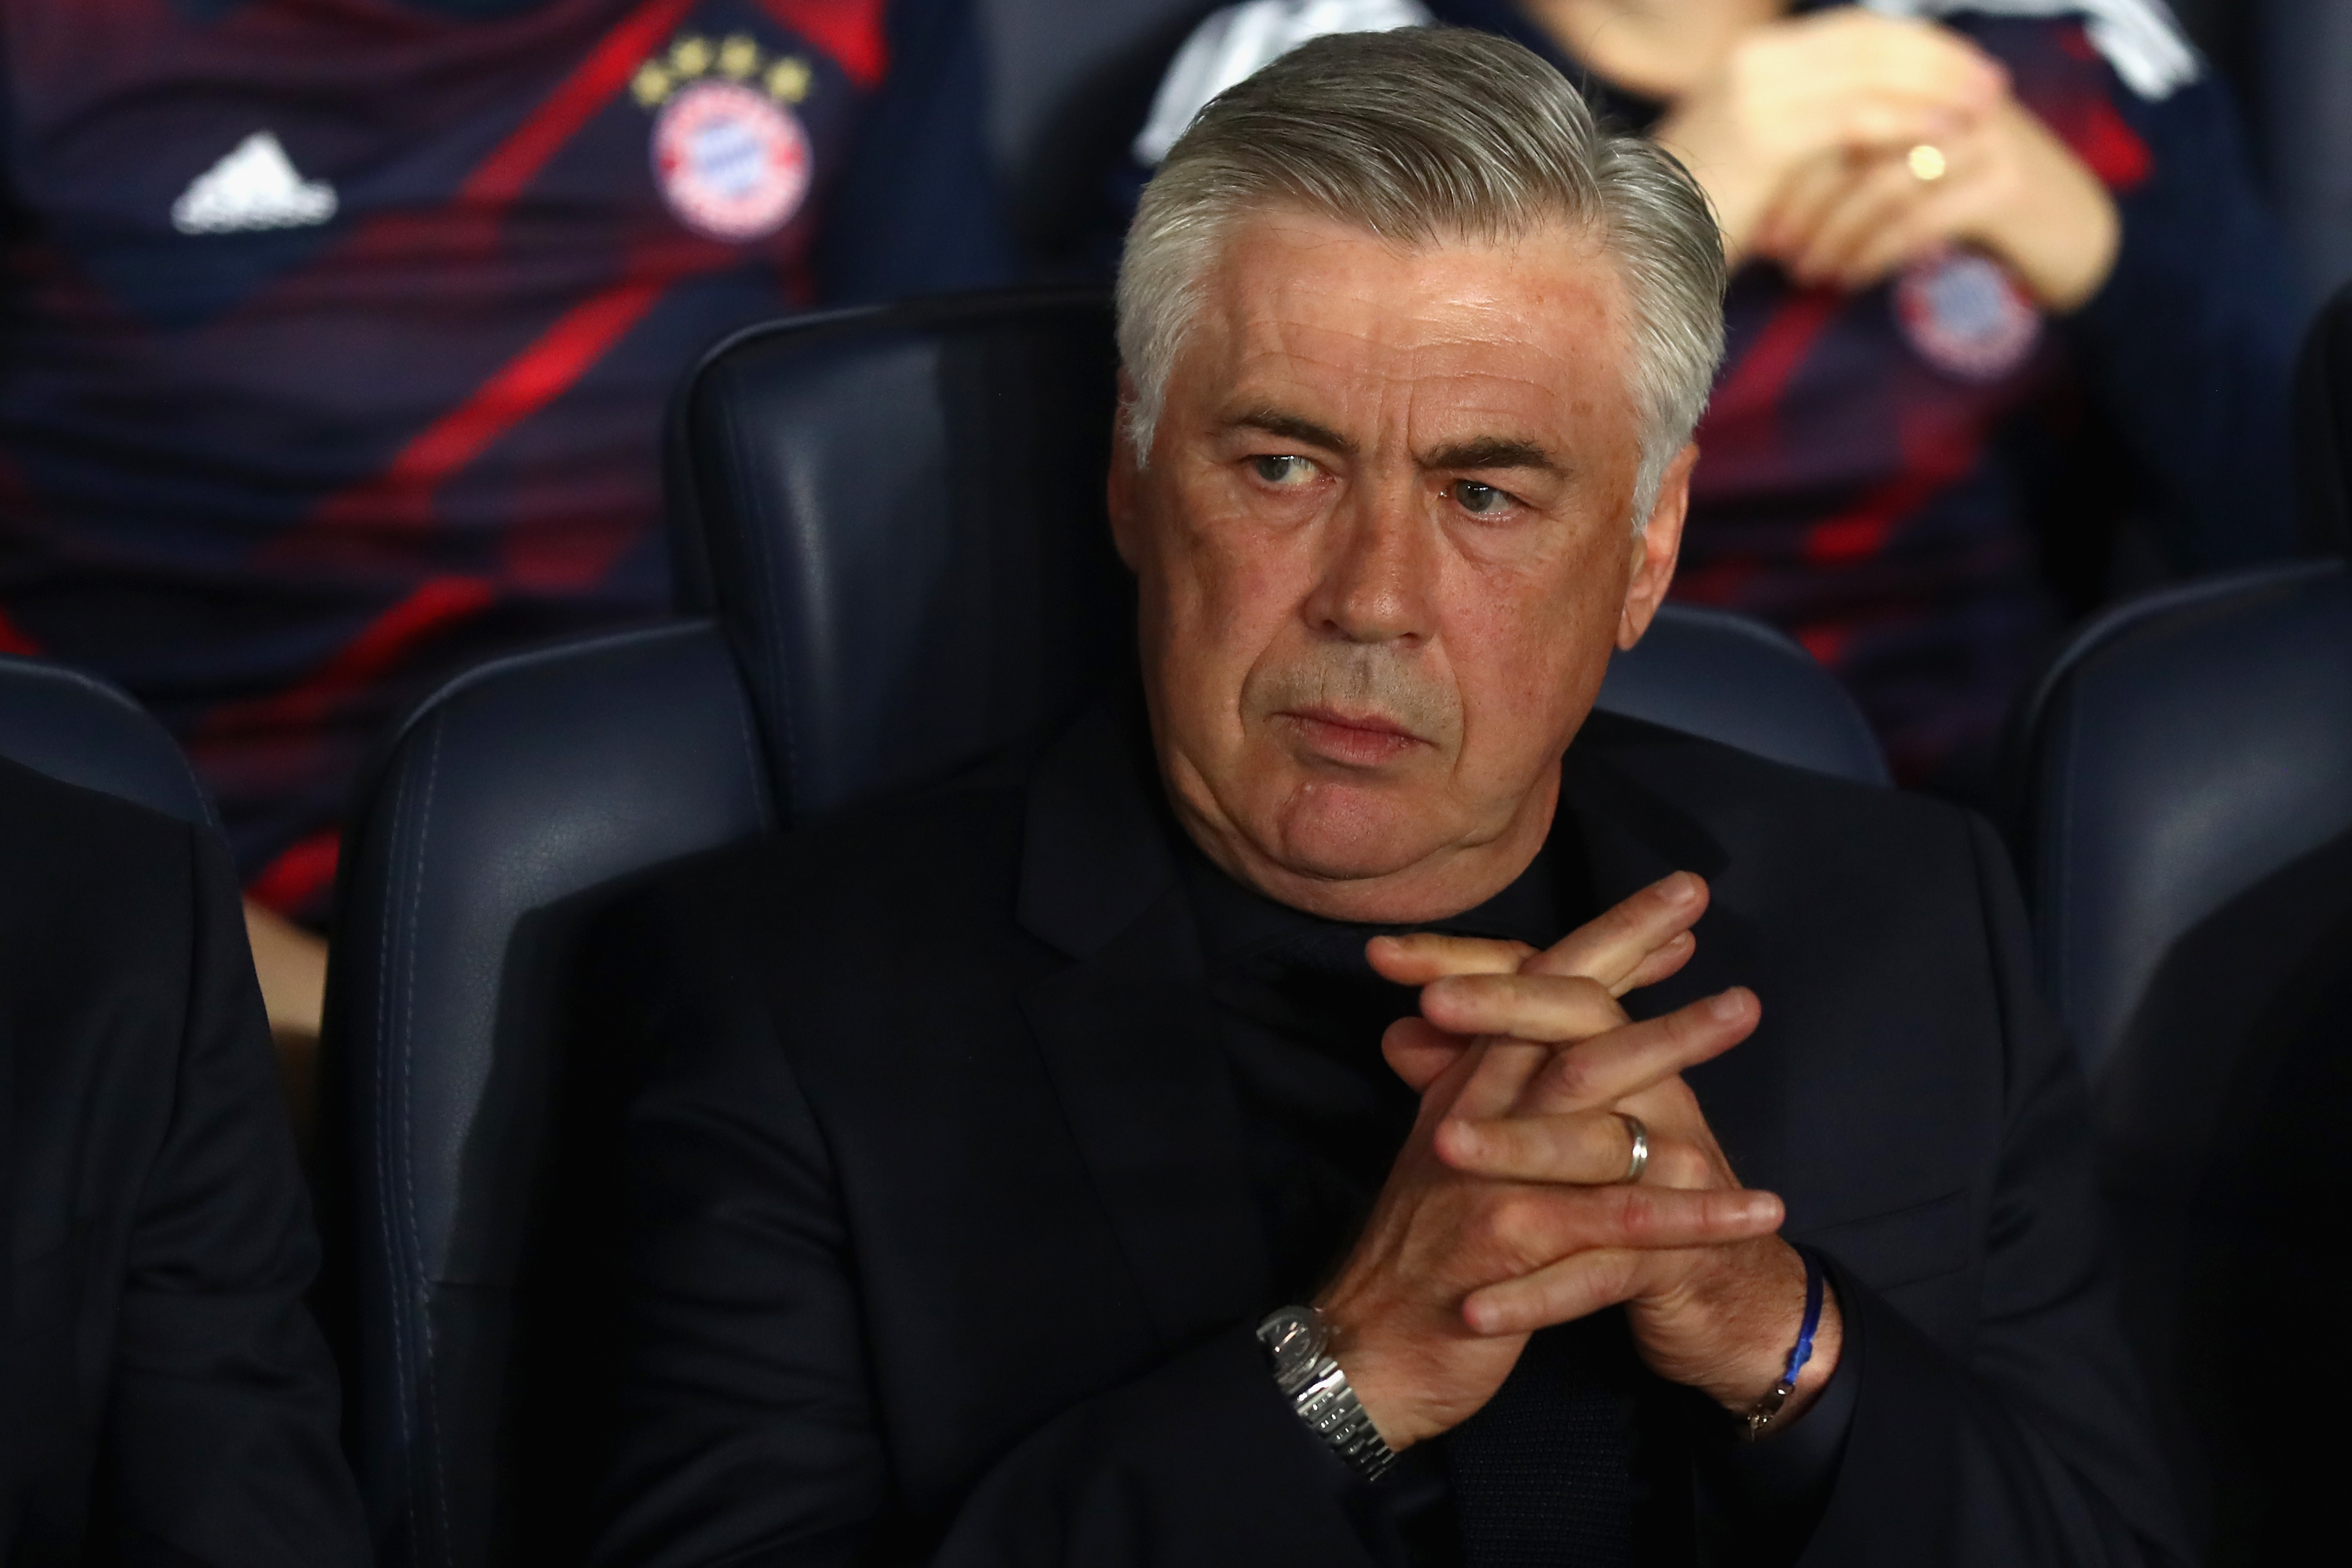 Carlo Ancelotti (FC Bayern Munich) le 27 septembre 2017à Paris